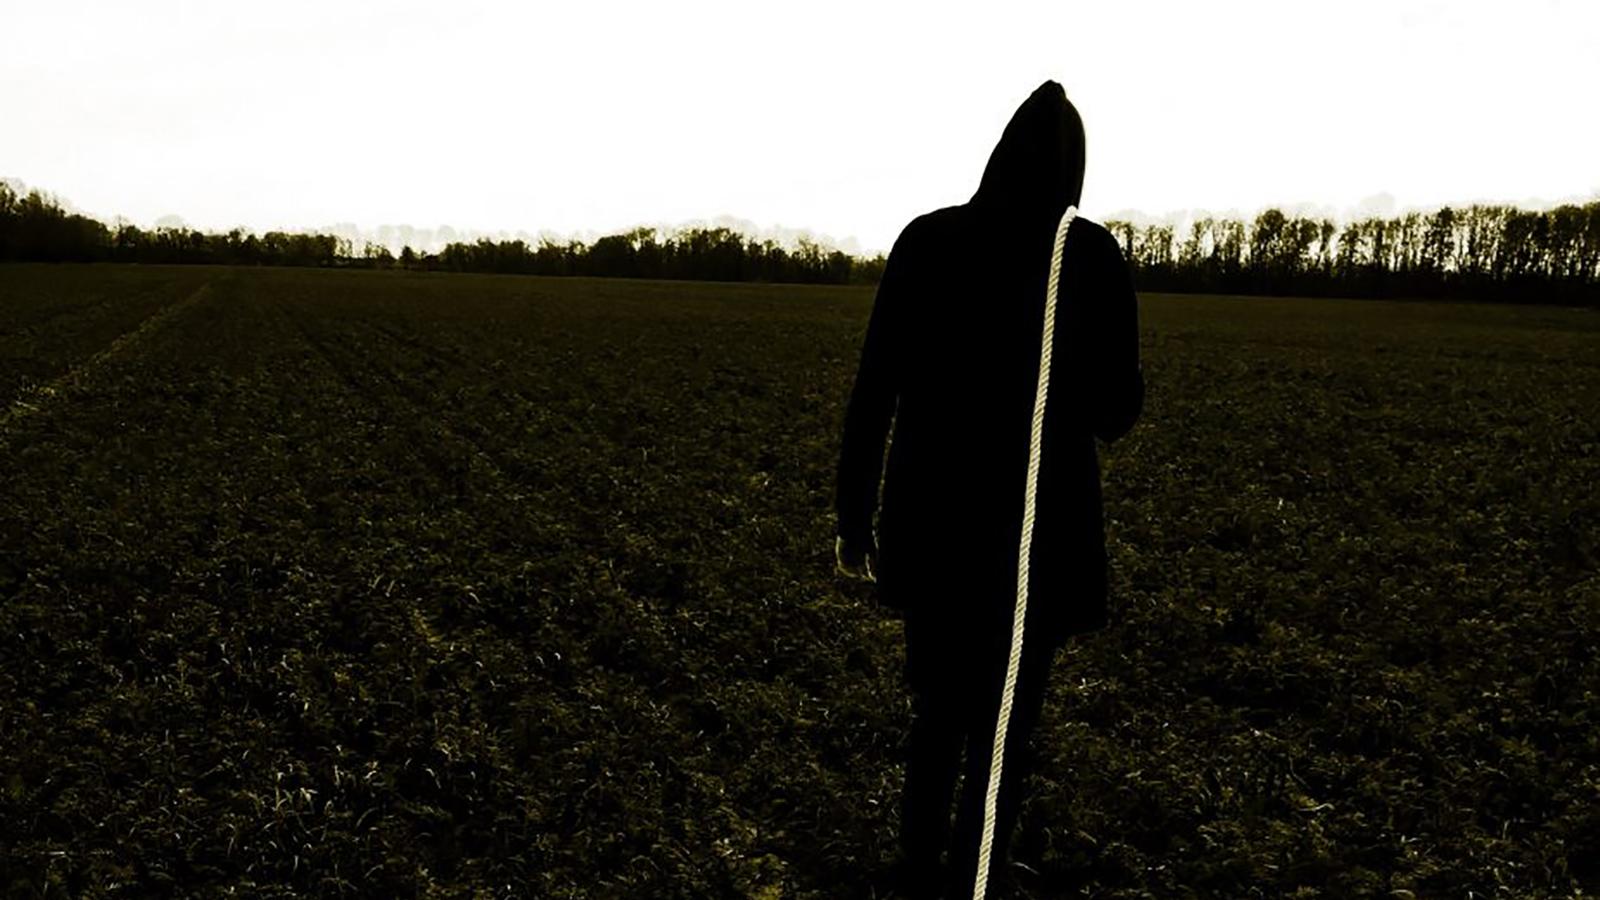 Hear Rope Sect's Stunning Debut Album Featuring Grave Pleasure's Khvost